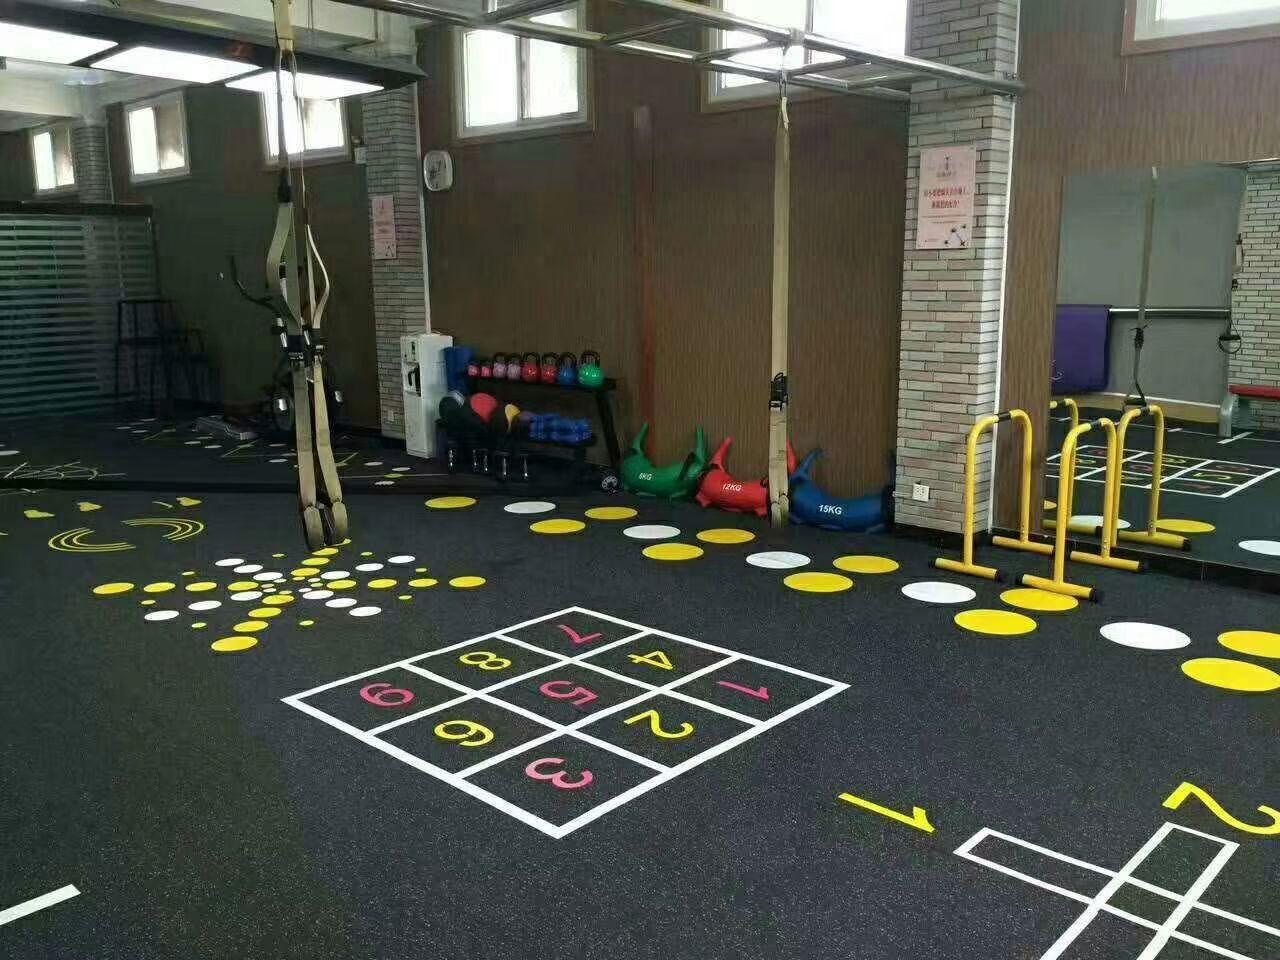 Uv Printed Rubber Mat For Gym Gym Flooring Rubber Rolled Rubber Flooring Rubber Flooring